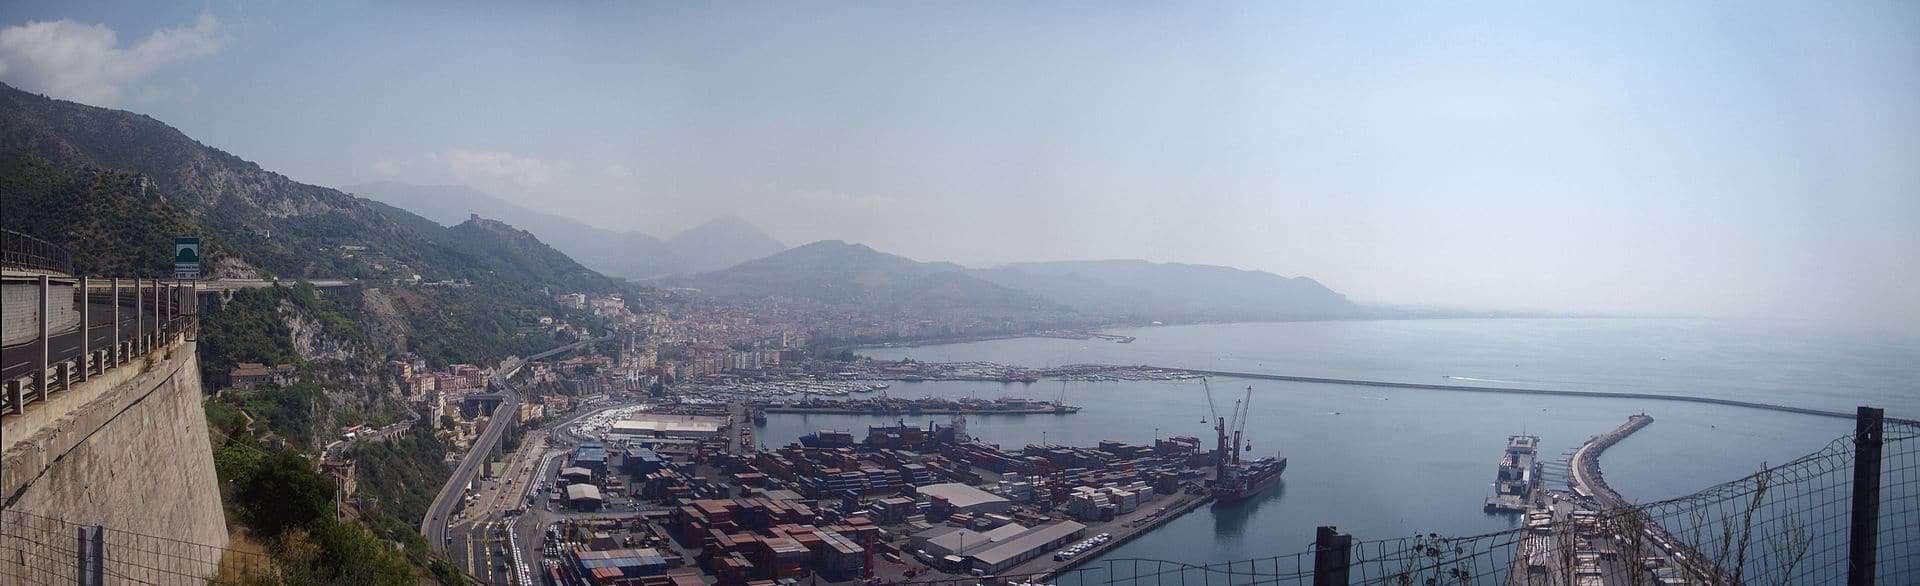 Salerno digitale terrestre lista frequenze canali